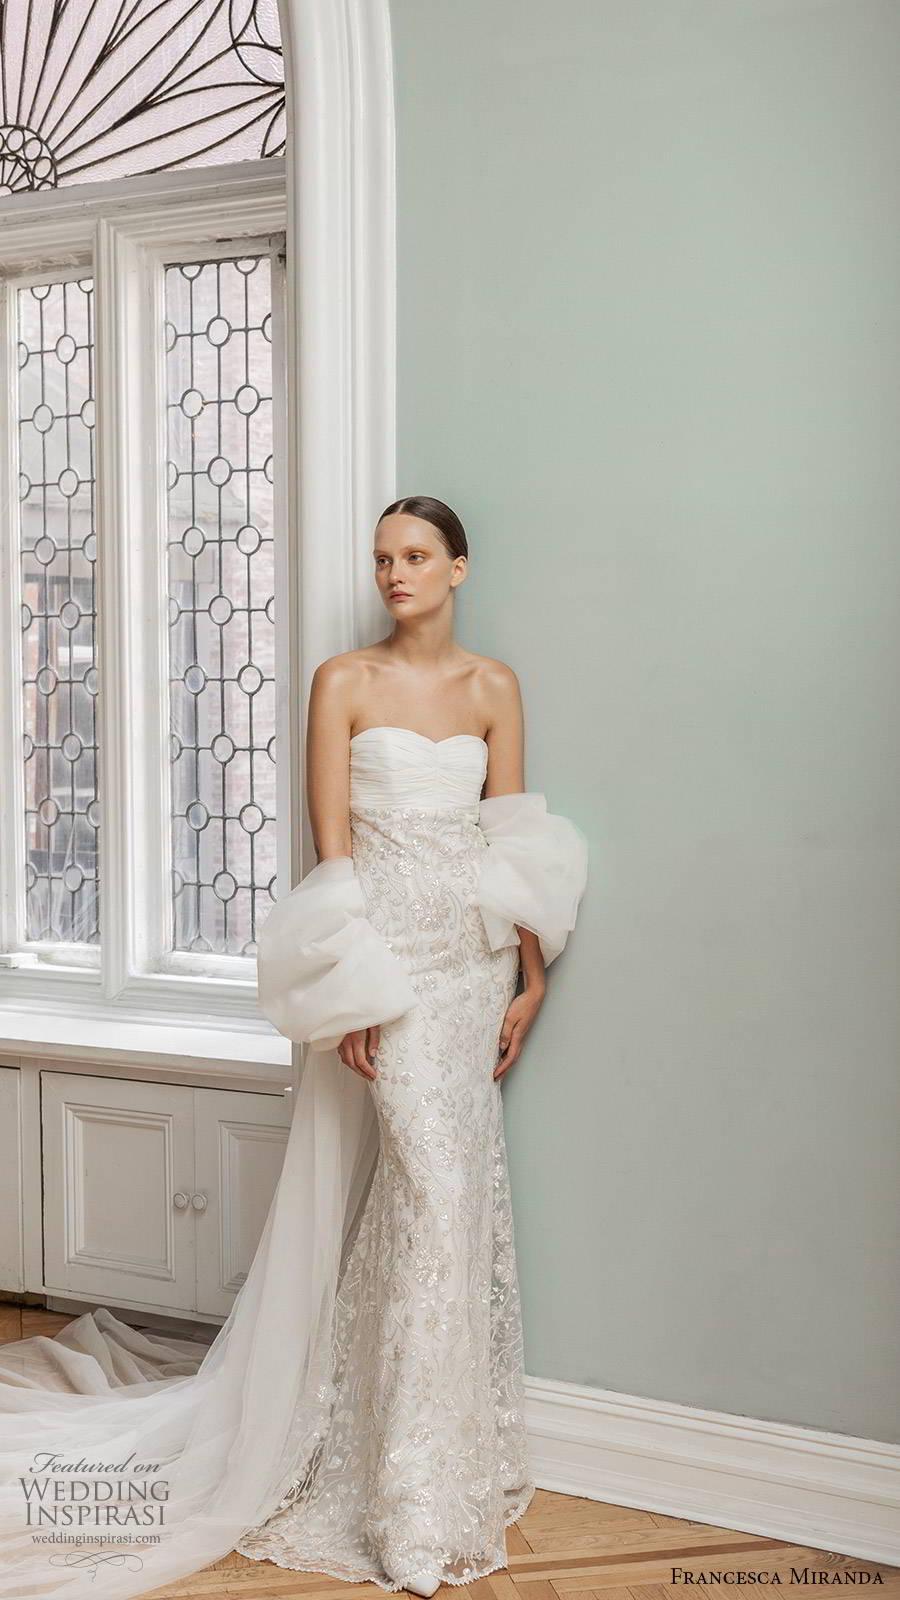 francesca miranda spring 2020 bridal strapless semi sweetheart neckling ruched bodice embellished skirt sheath wedding dress modern glam glitzy chapel train (8) mv